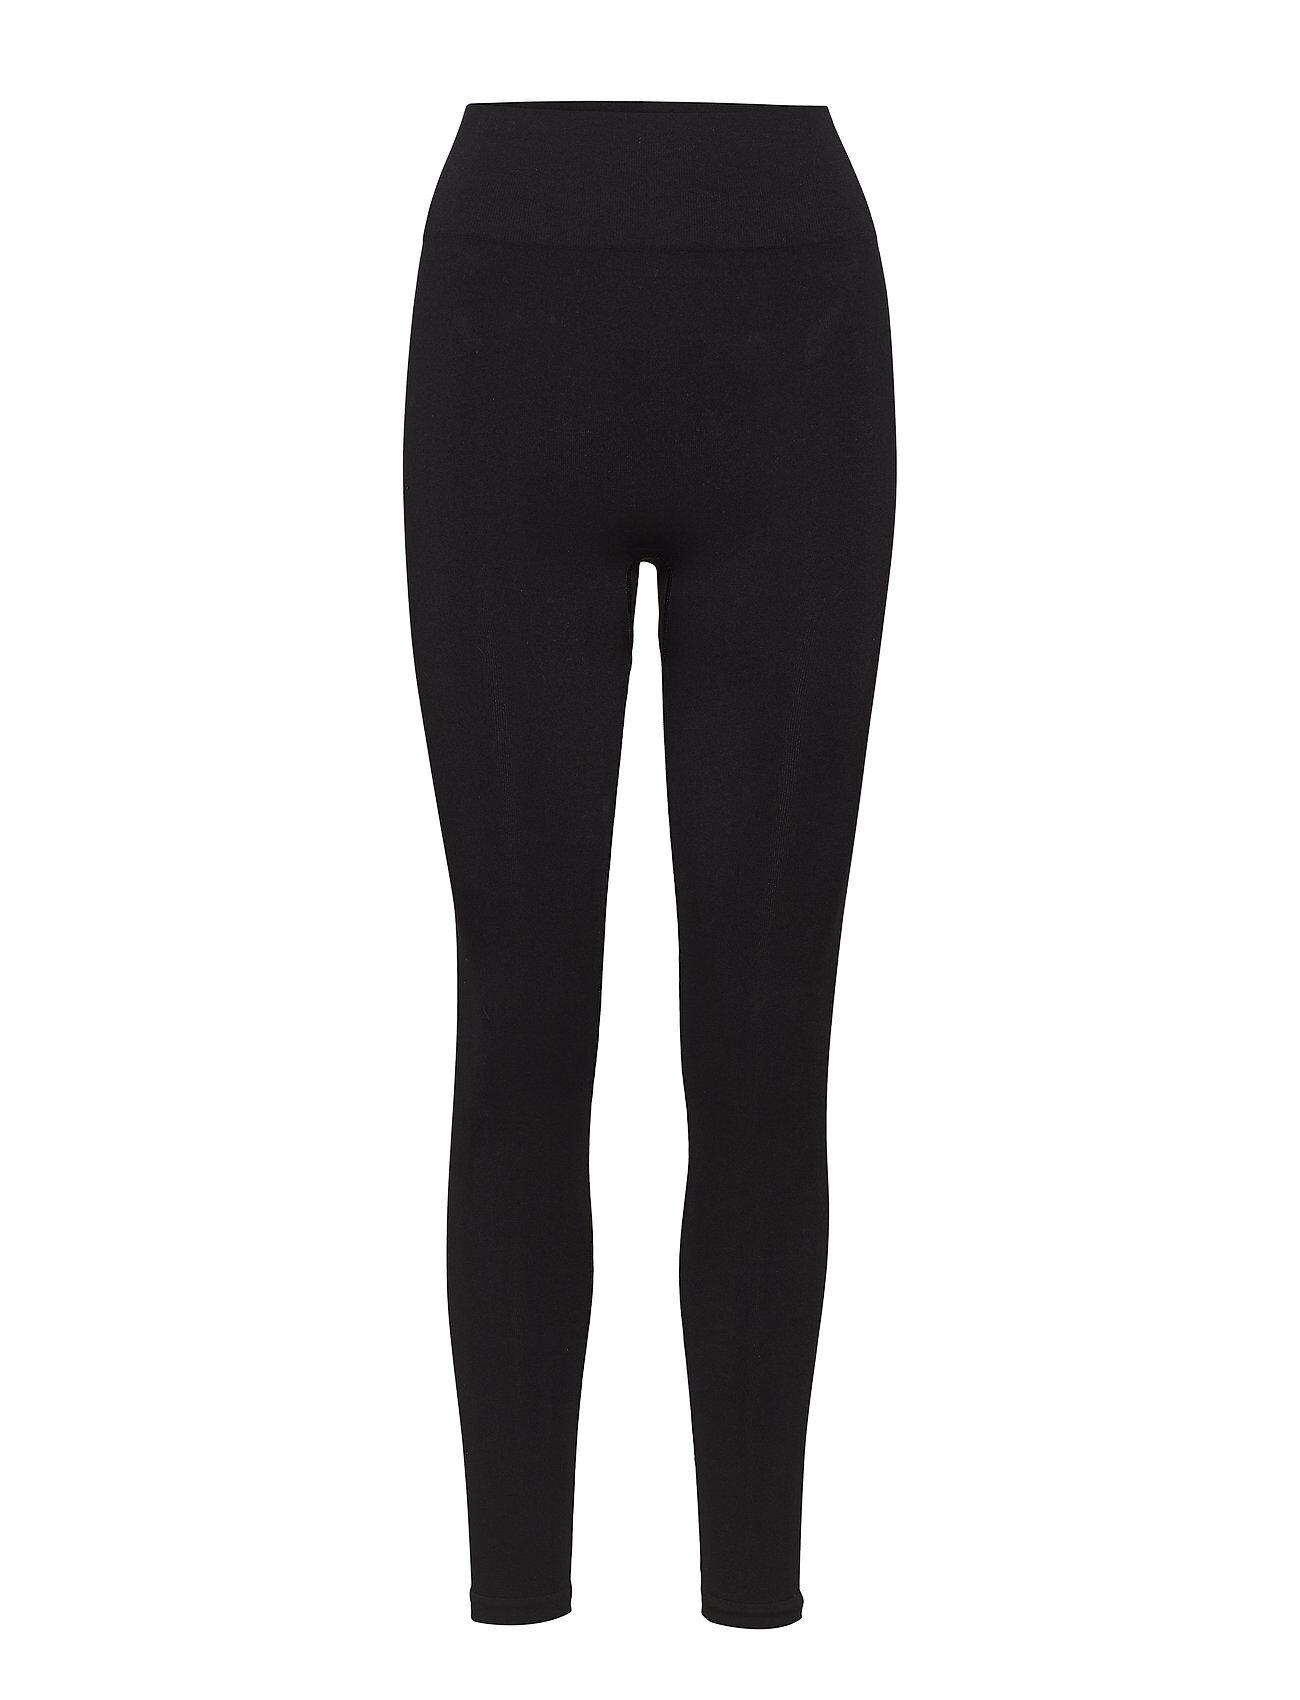 Image of Filippa K Soft Sport Seamless Compression Legging Running/training Tights Musta Filippa K Soft Sport